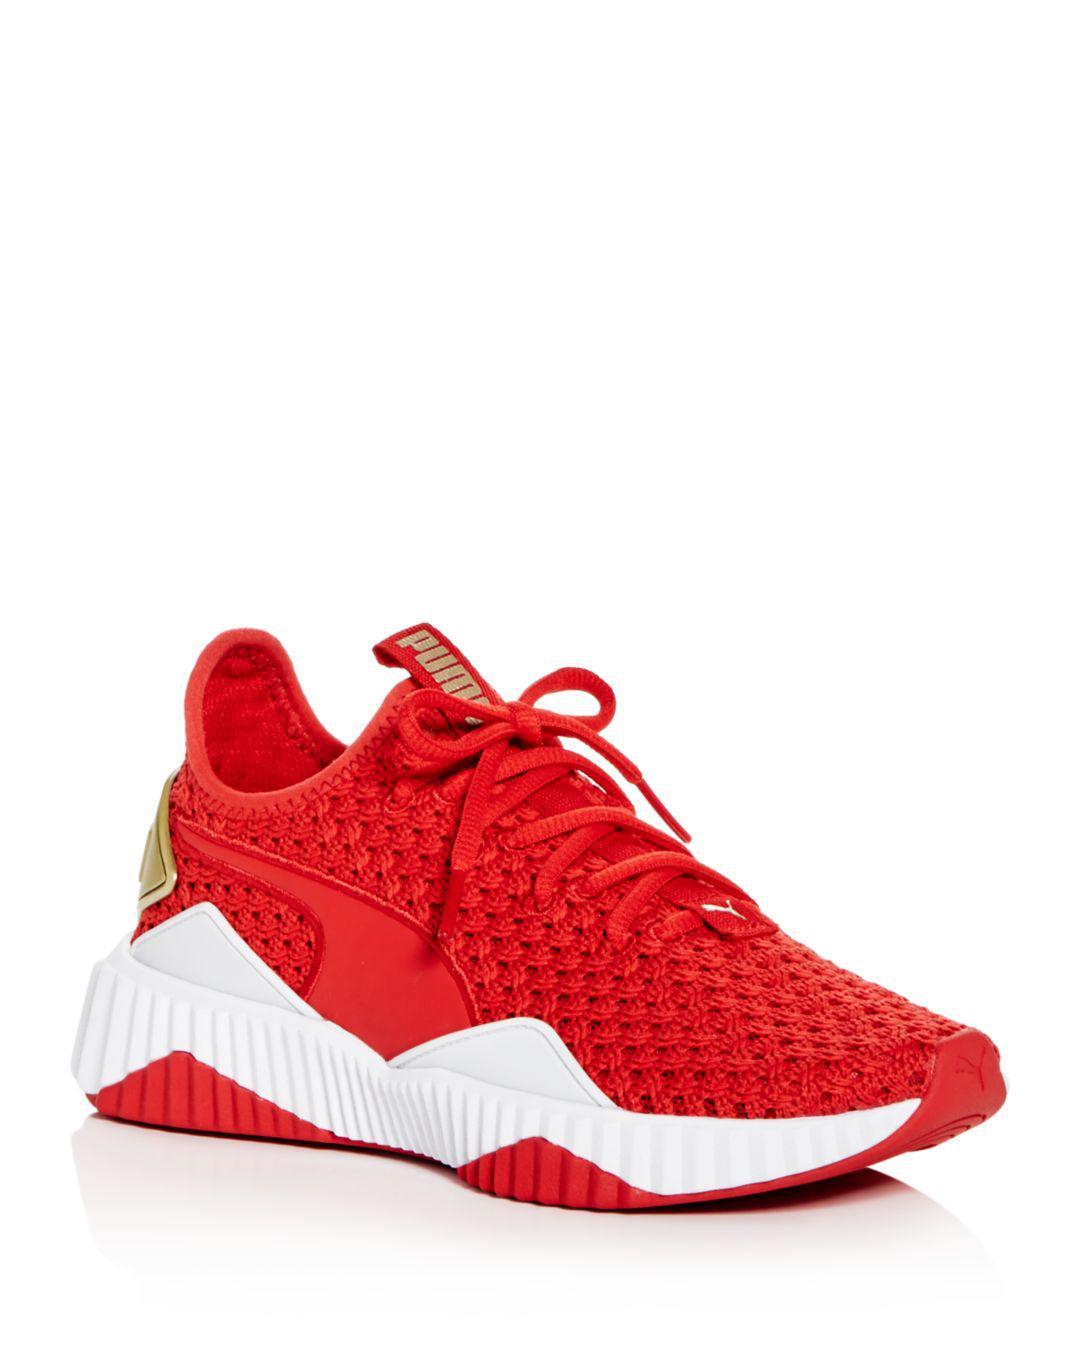 73b8b44226b617 Lyst - PUMA Women s Defy Varsity Knit Lace Up Sneakers in Red